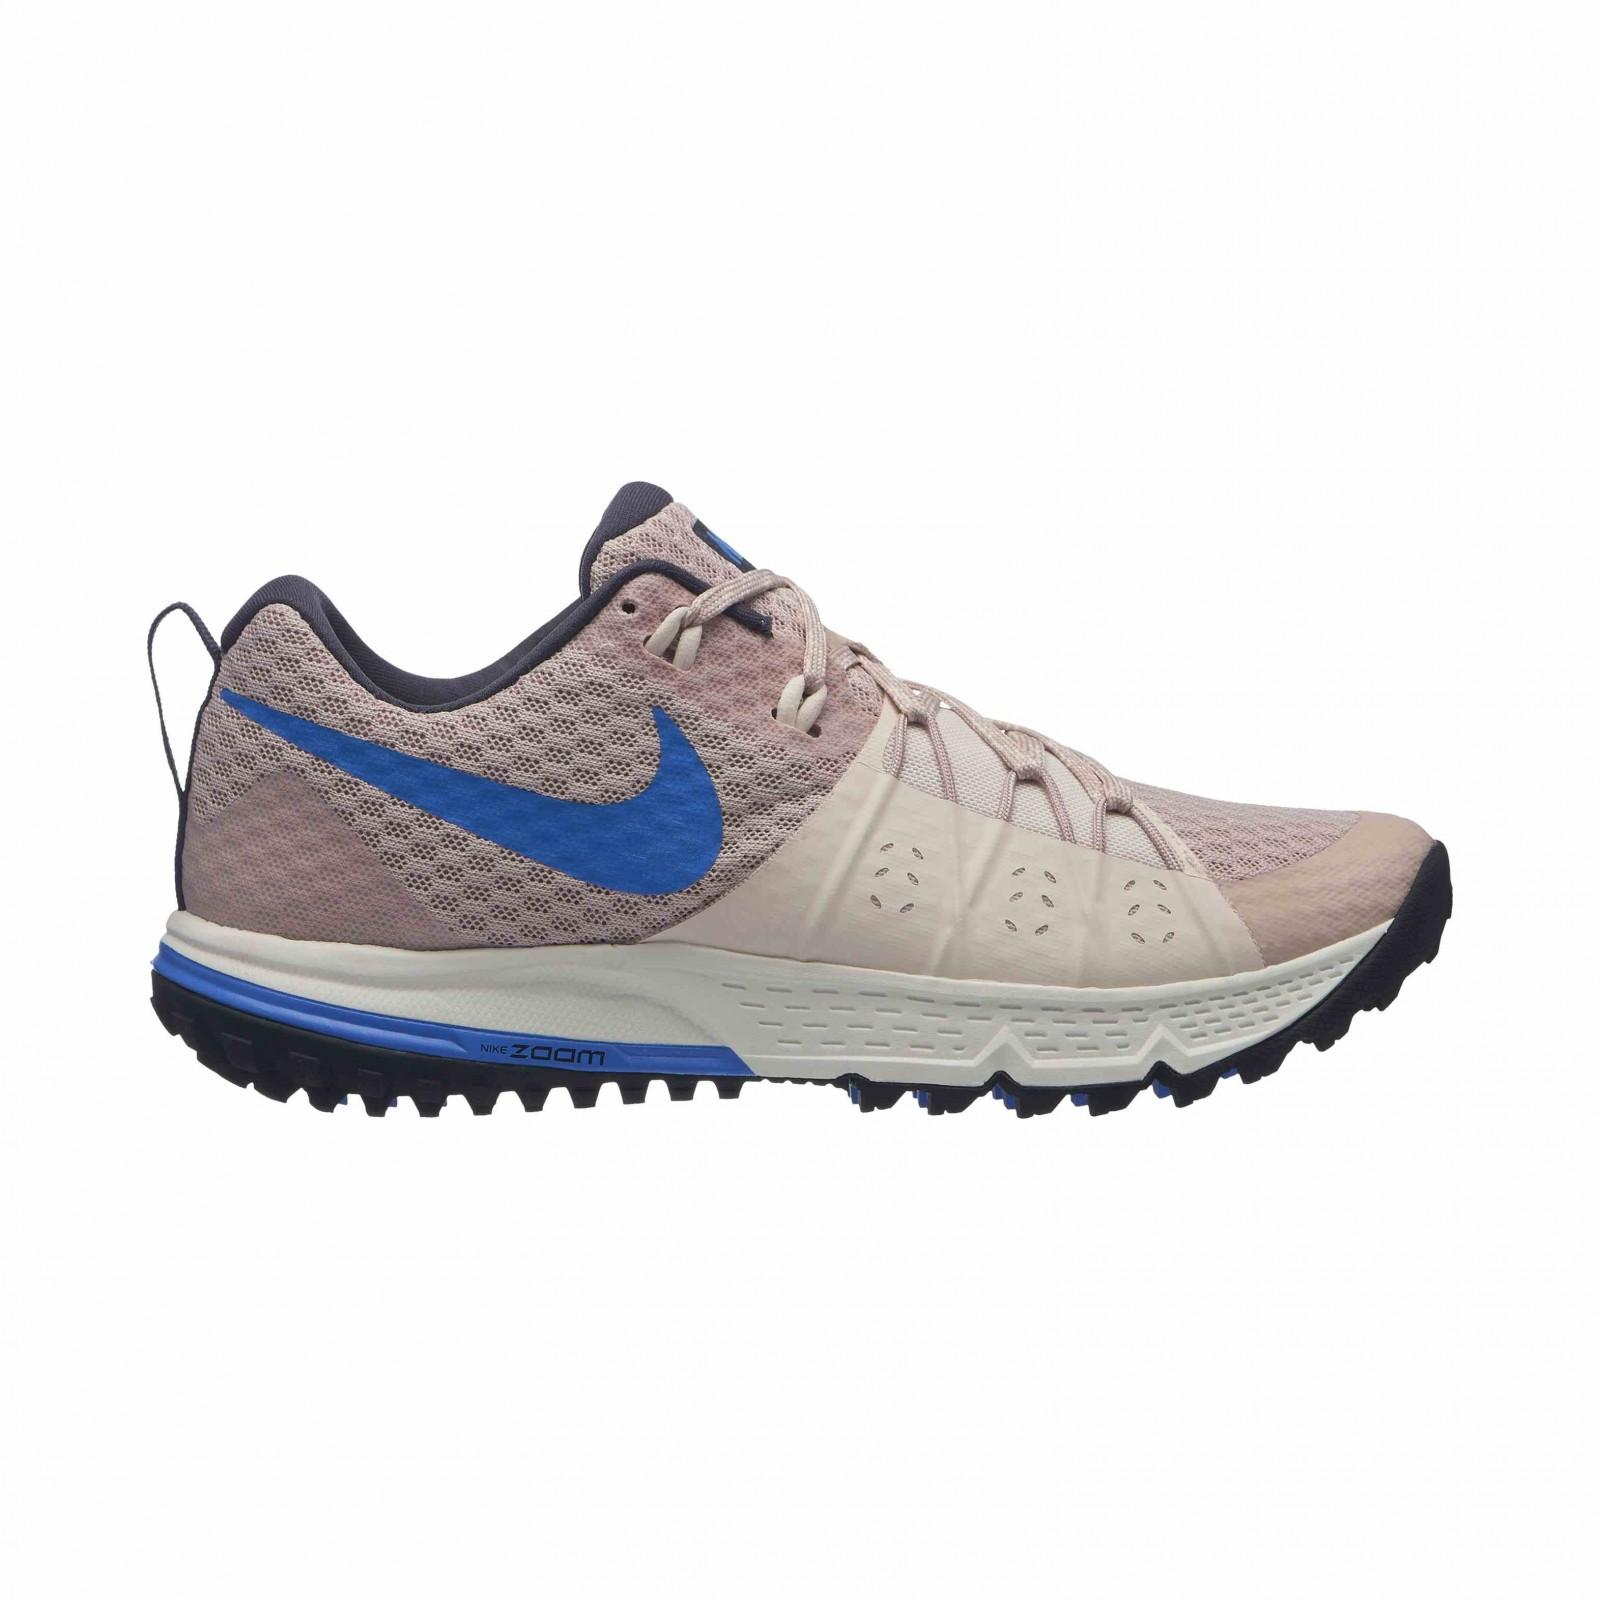 Dámské Běžecké boty Nike WMNS AIR ZOOM WILDHORSE 4  b45bac04bb